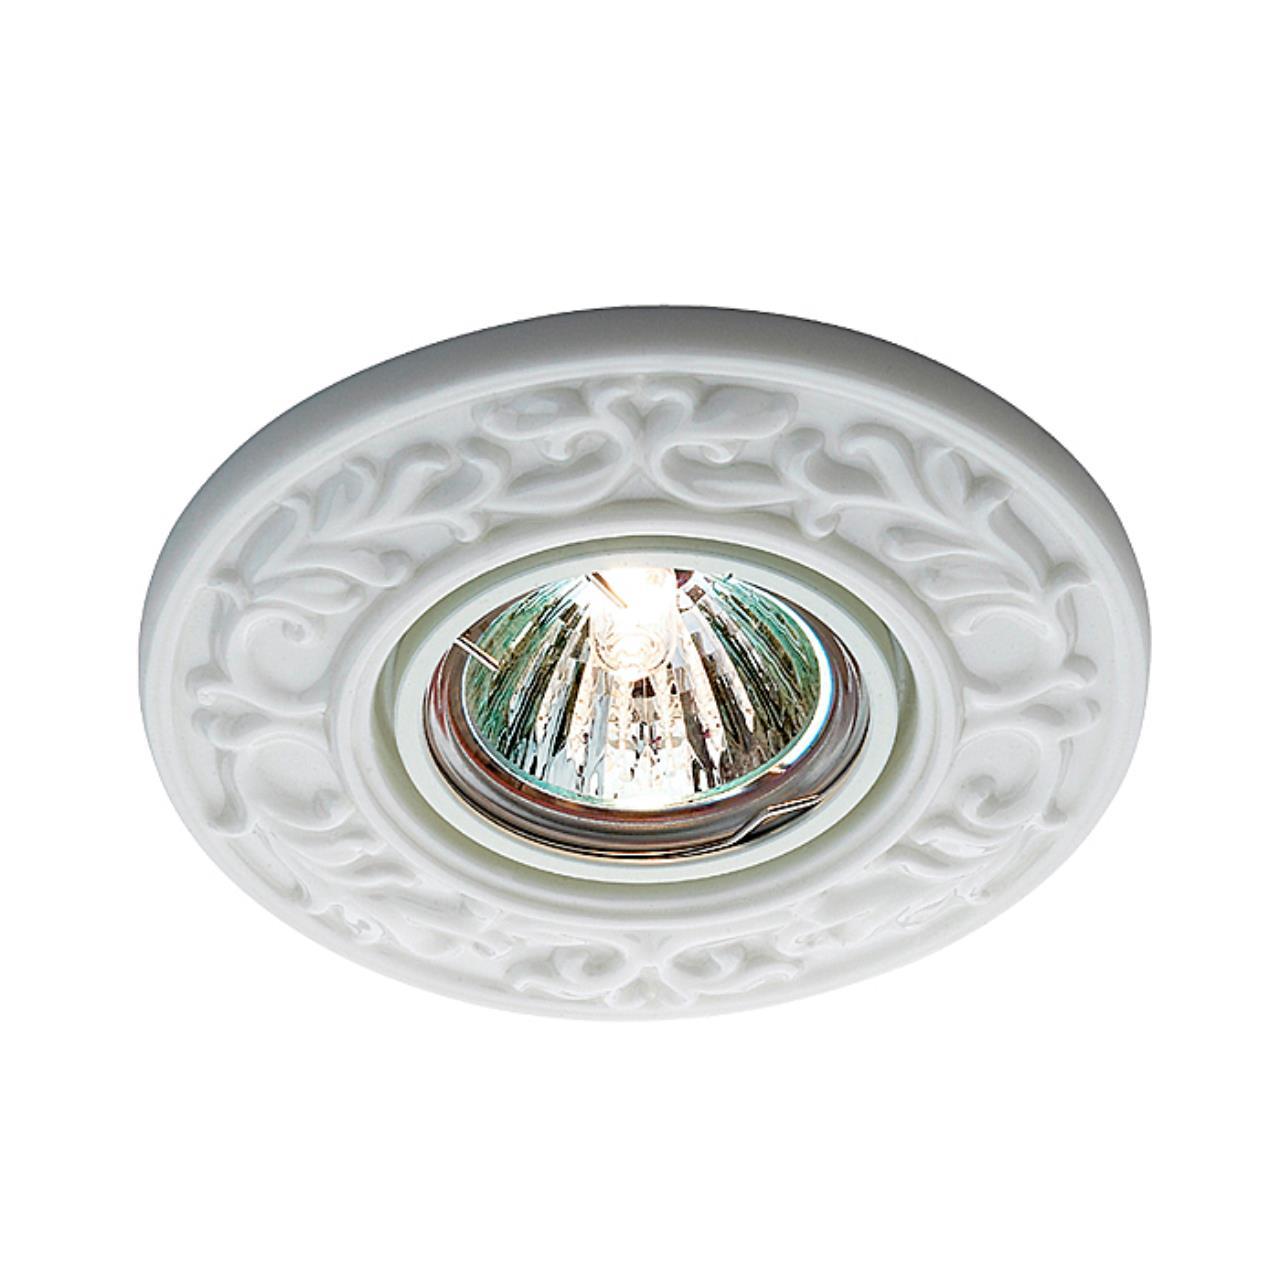 369868 SPOT NT14 120 белый Встраиваемый светильник IP20 GX5.3 50W 12V FARFOR